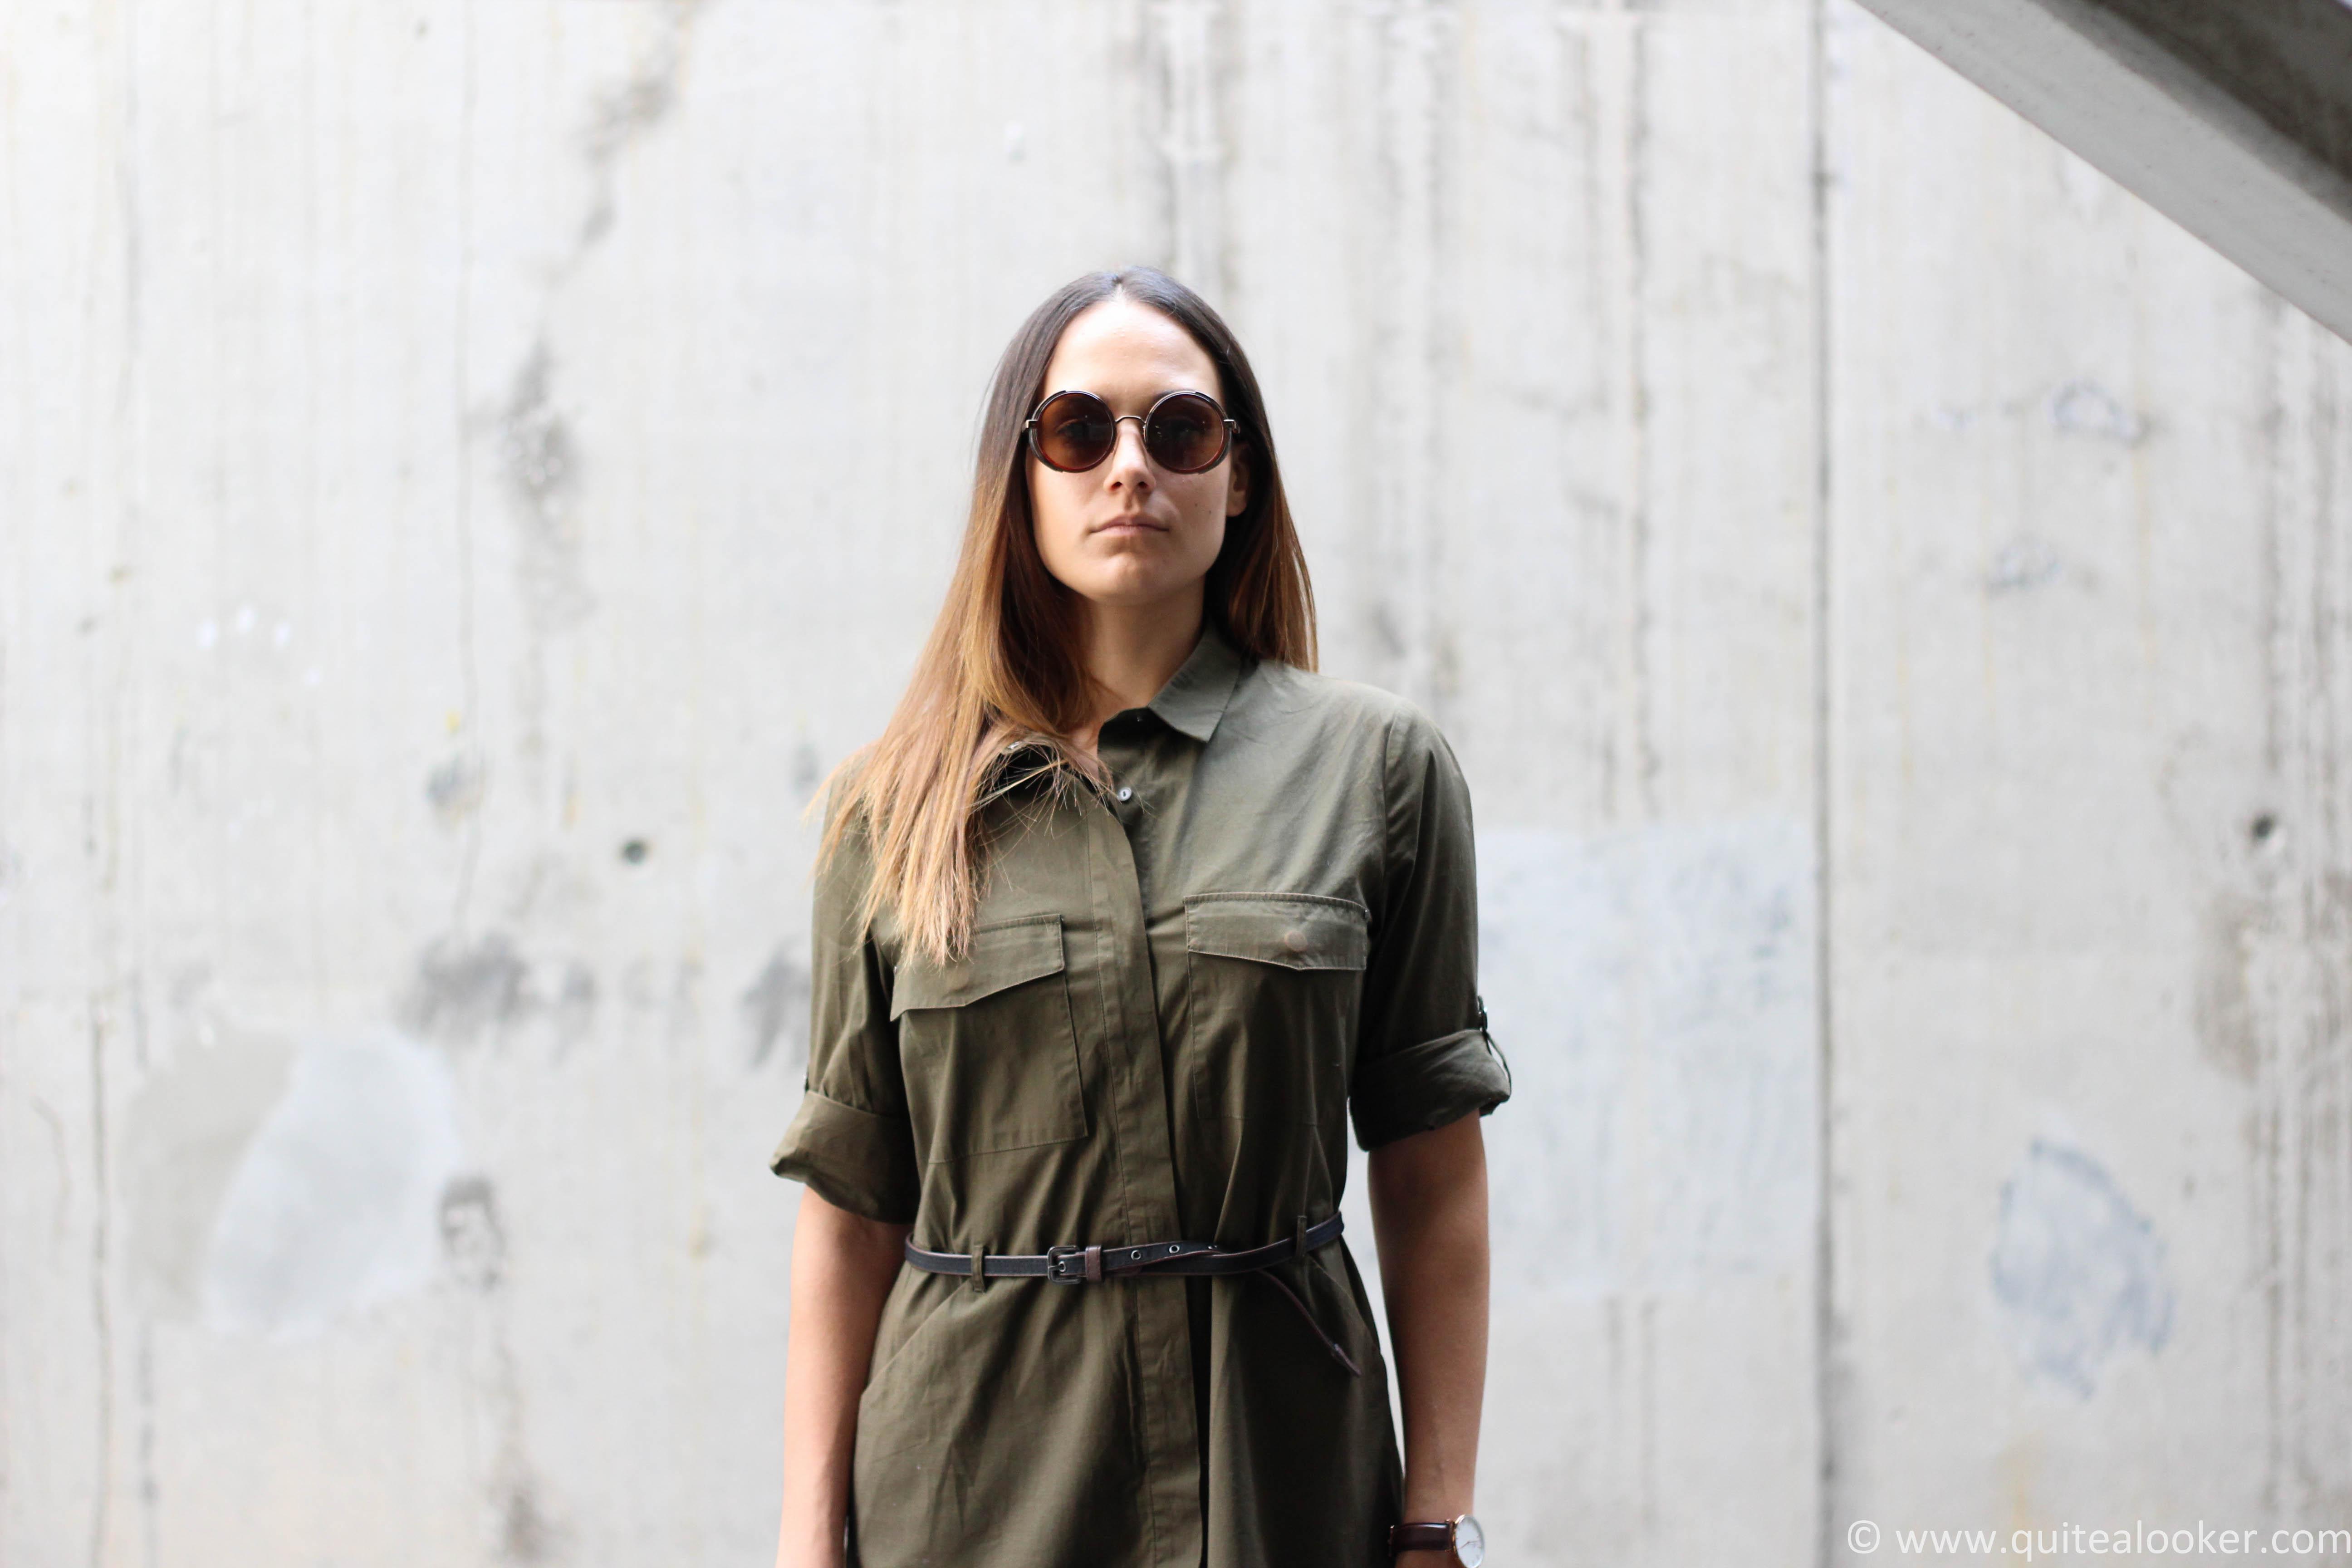 Green Mango shirt dress outfit by Bulgarian fashion blogger Michaella from Quite a Looker | Deichmann high heels, H&M mini shoulder bag